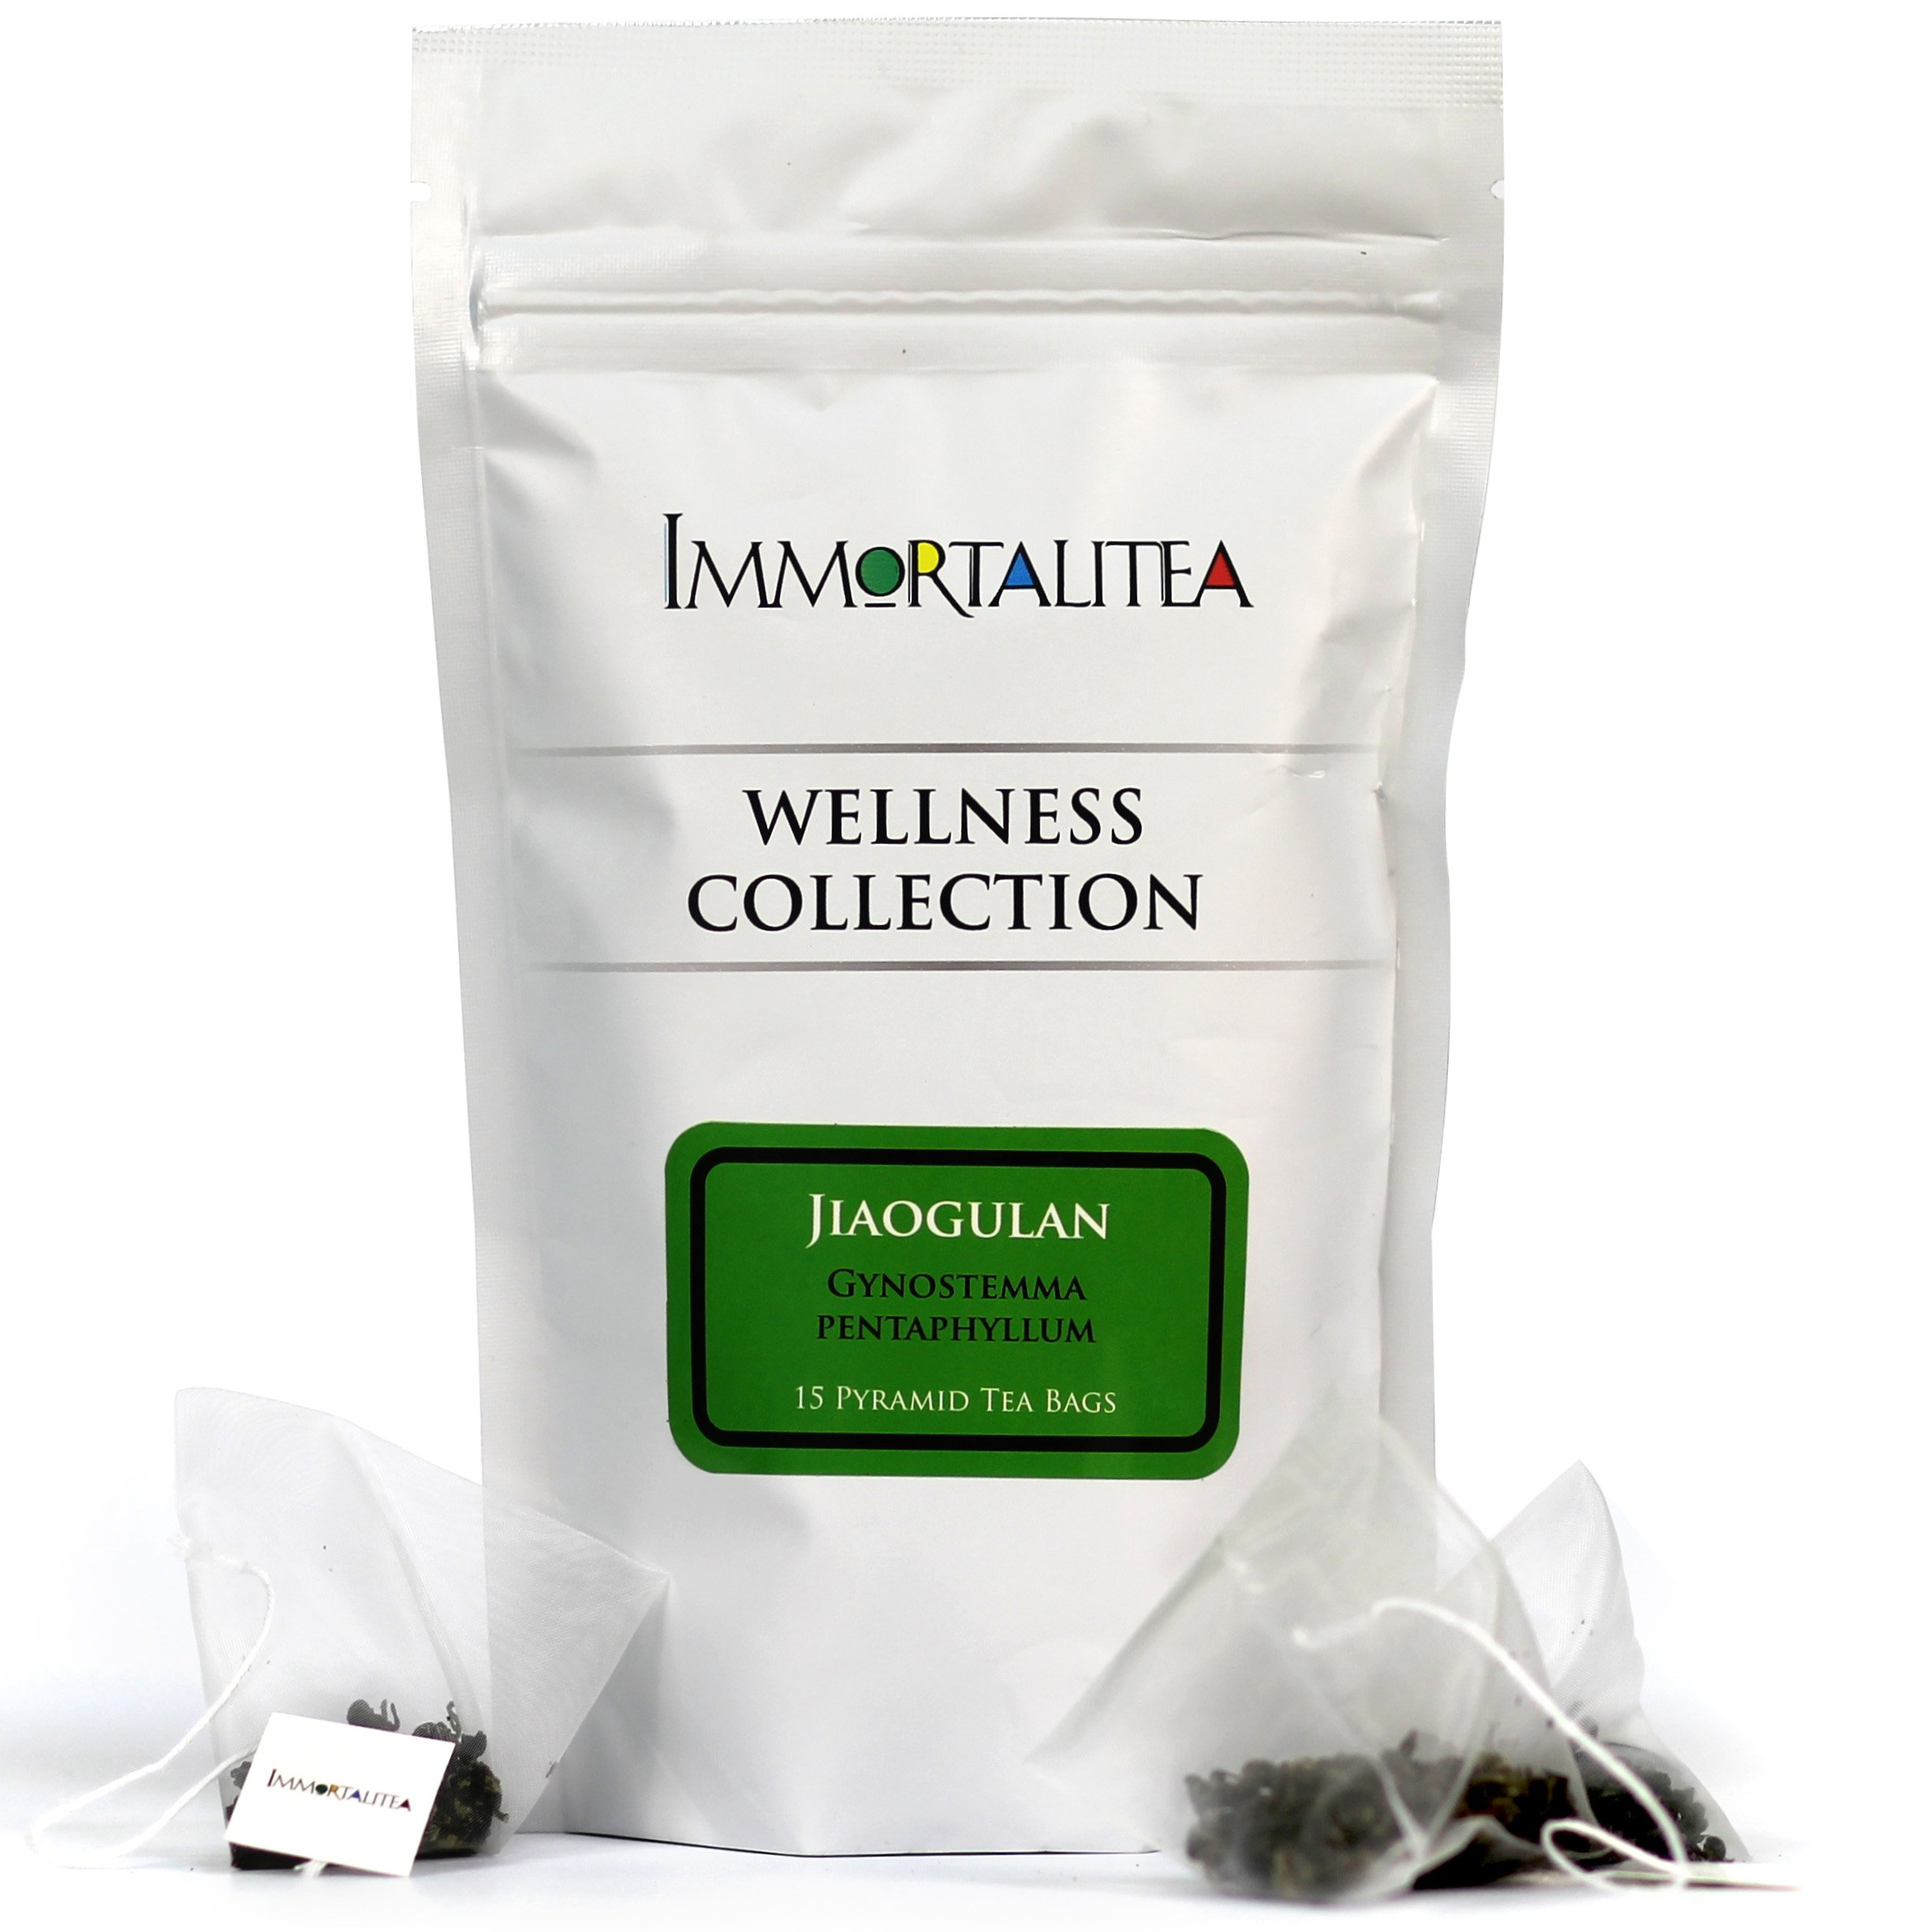 Gynostemma Tea - Jiaogulan AMPK Activator Herbal Tea - Potent Antioxidant & Adaptogenic Longevity Herb - All Natural Caffeine-Free Immortality Herb - 15 Pyramid Tea Bags by Immortalitea